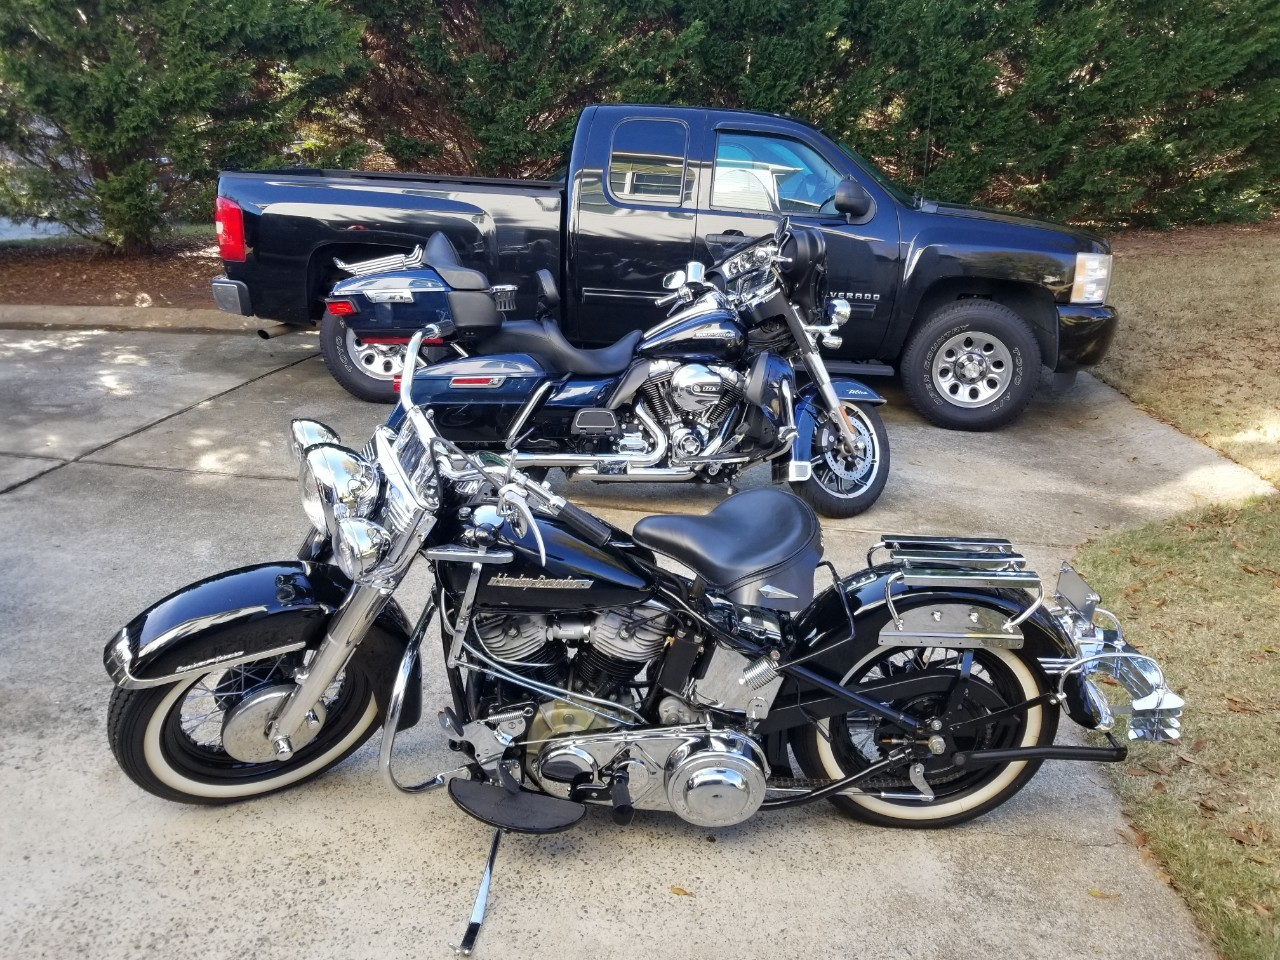 Marietta, GA - S For Sale - S Motorcycle,528553,1049211046